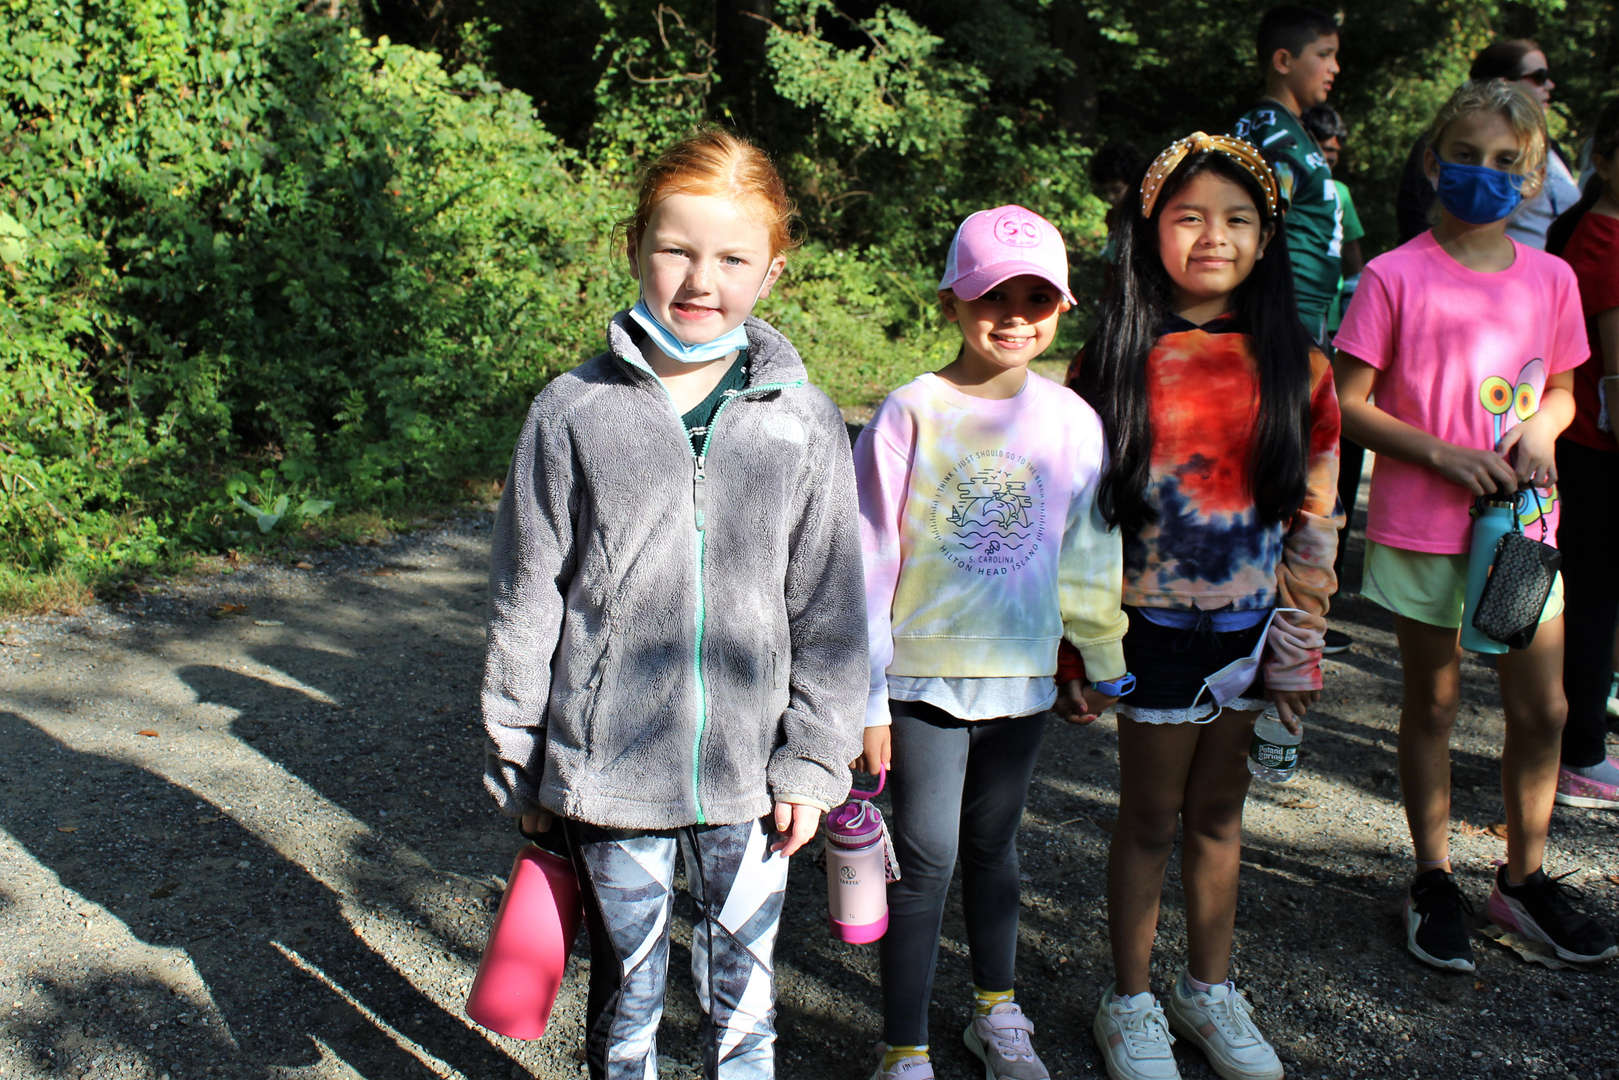 Three Pocantico Hills School girls walk on a path at Rockefeller State Park Preserve Oct. 8.